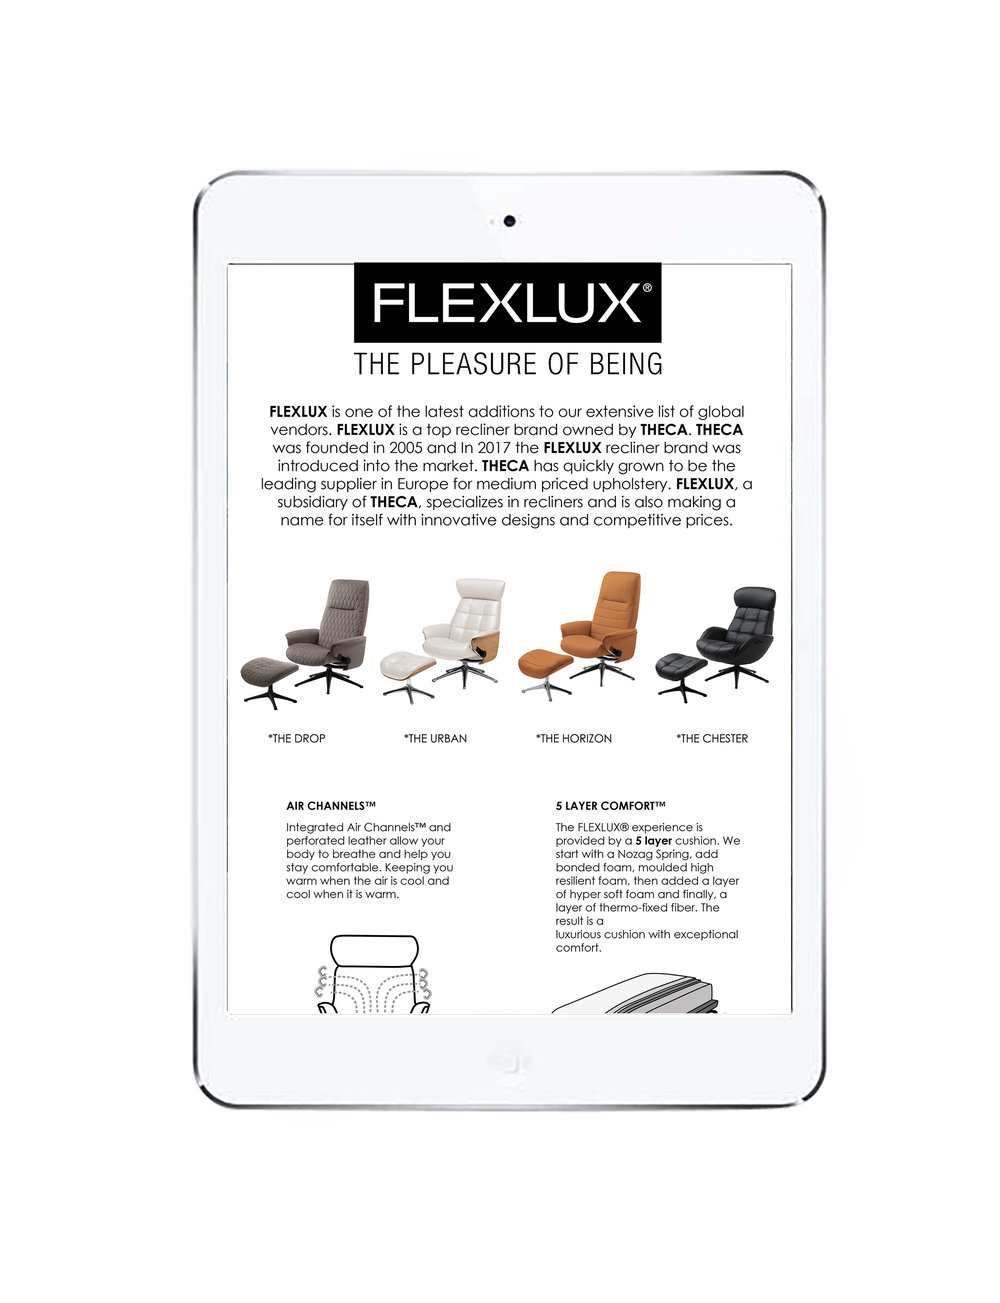 THECA_FLEXLUX_IPAD_MOCKUP.jpg